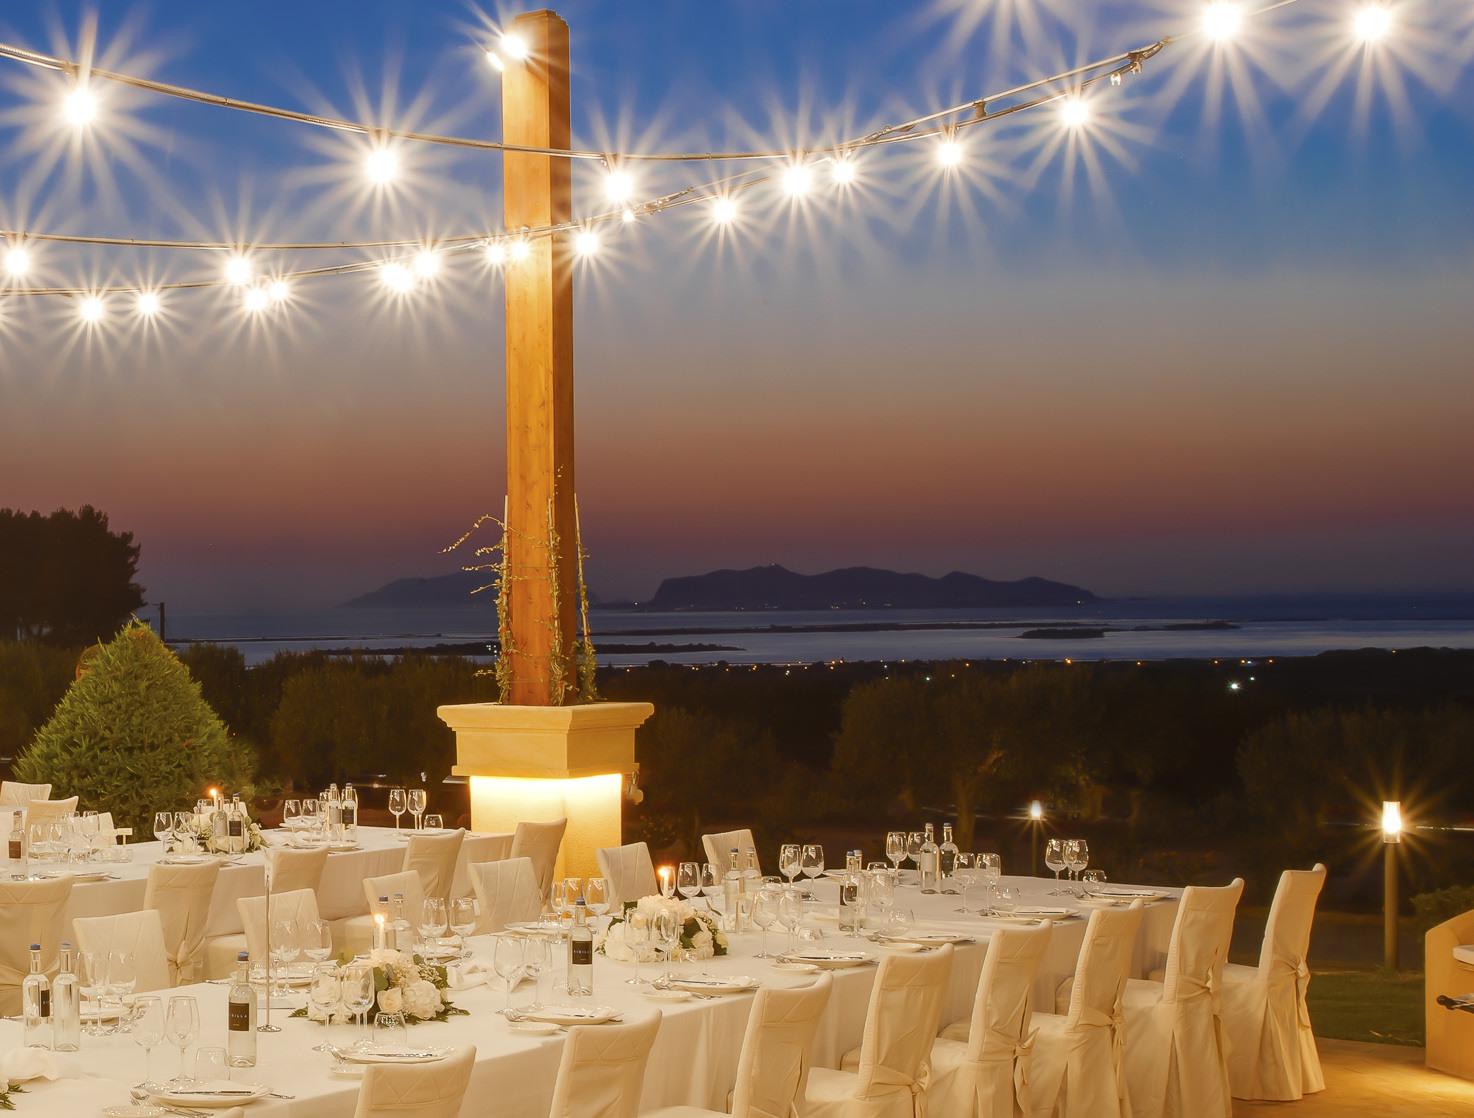 Wedding banquet in the gardens of Baglio Oneto